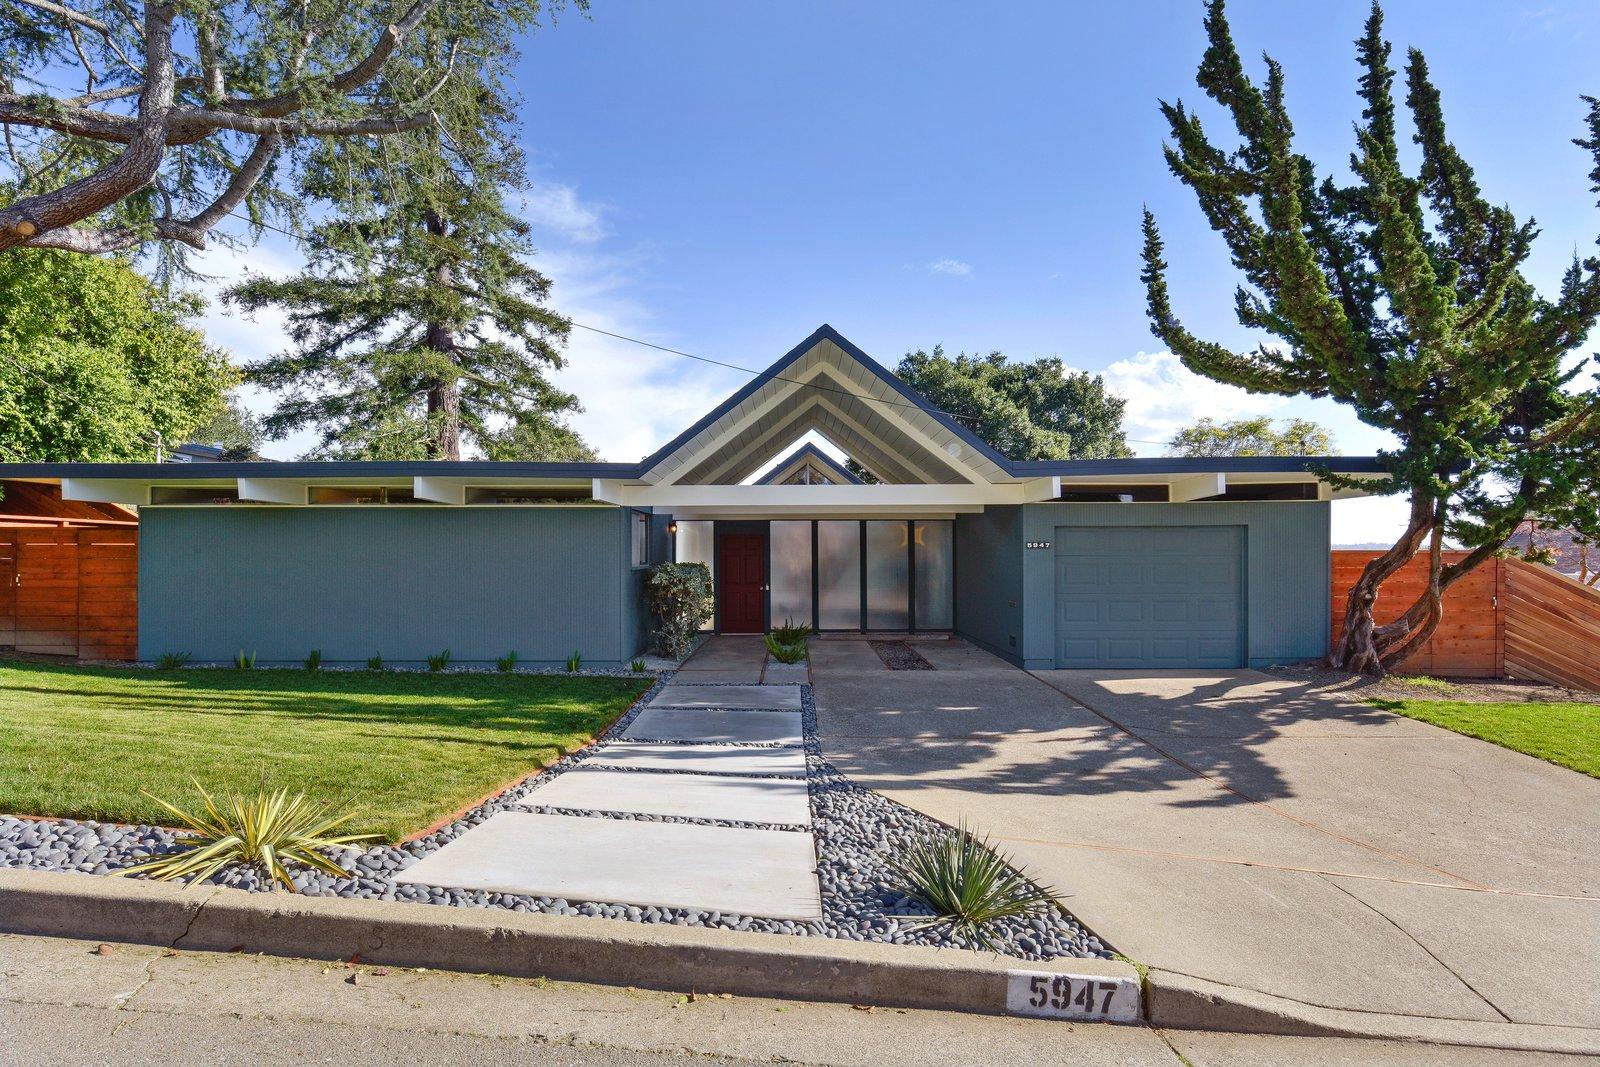 5947 Highwood Road Castro Valley Eichler exterior